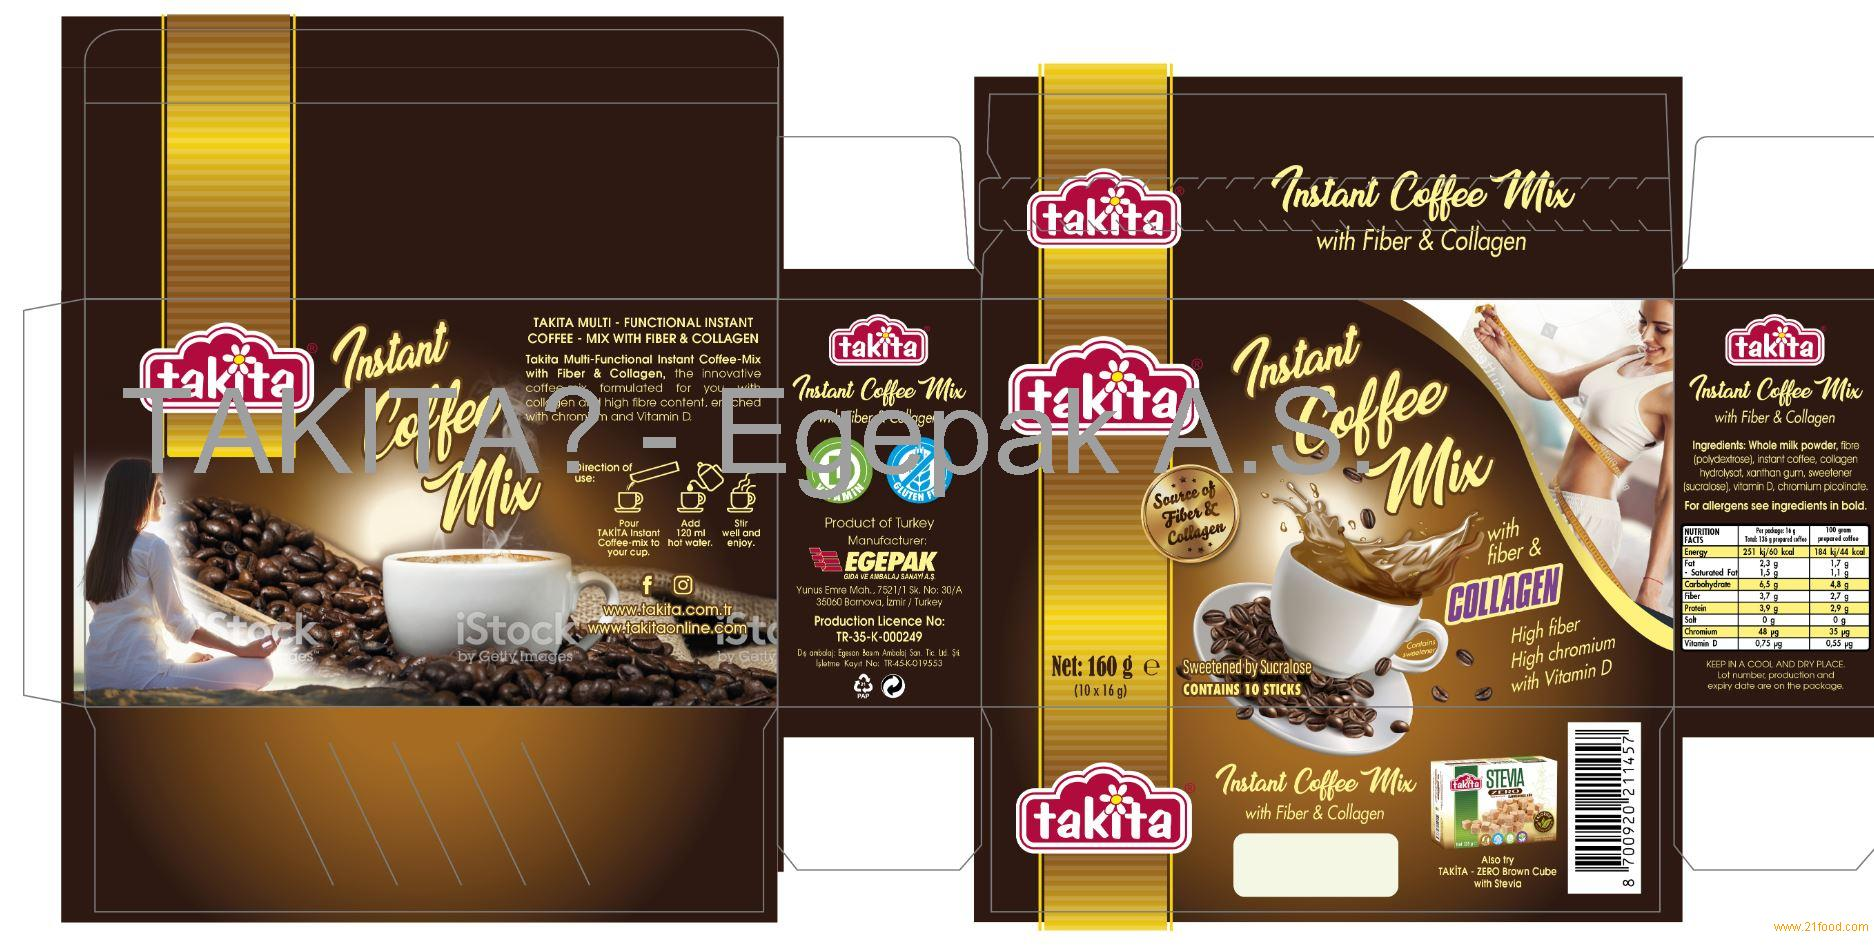 Instant Sugar free Colagen & Chrome added Coffee